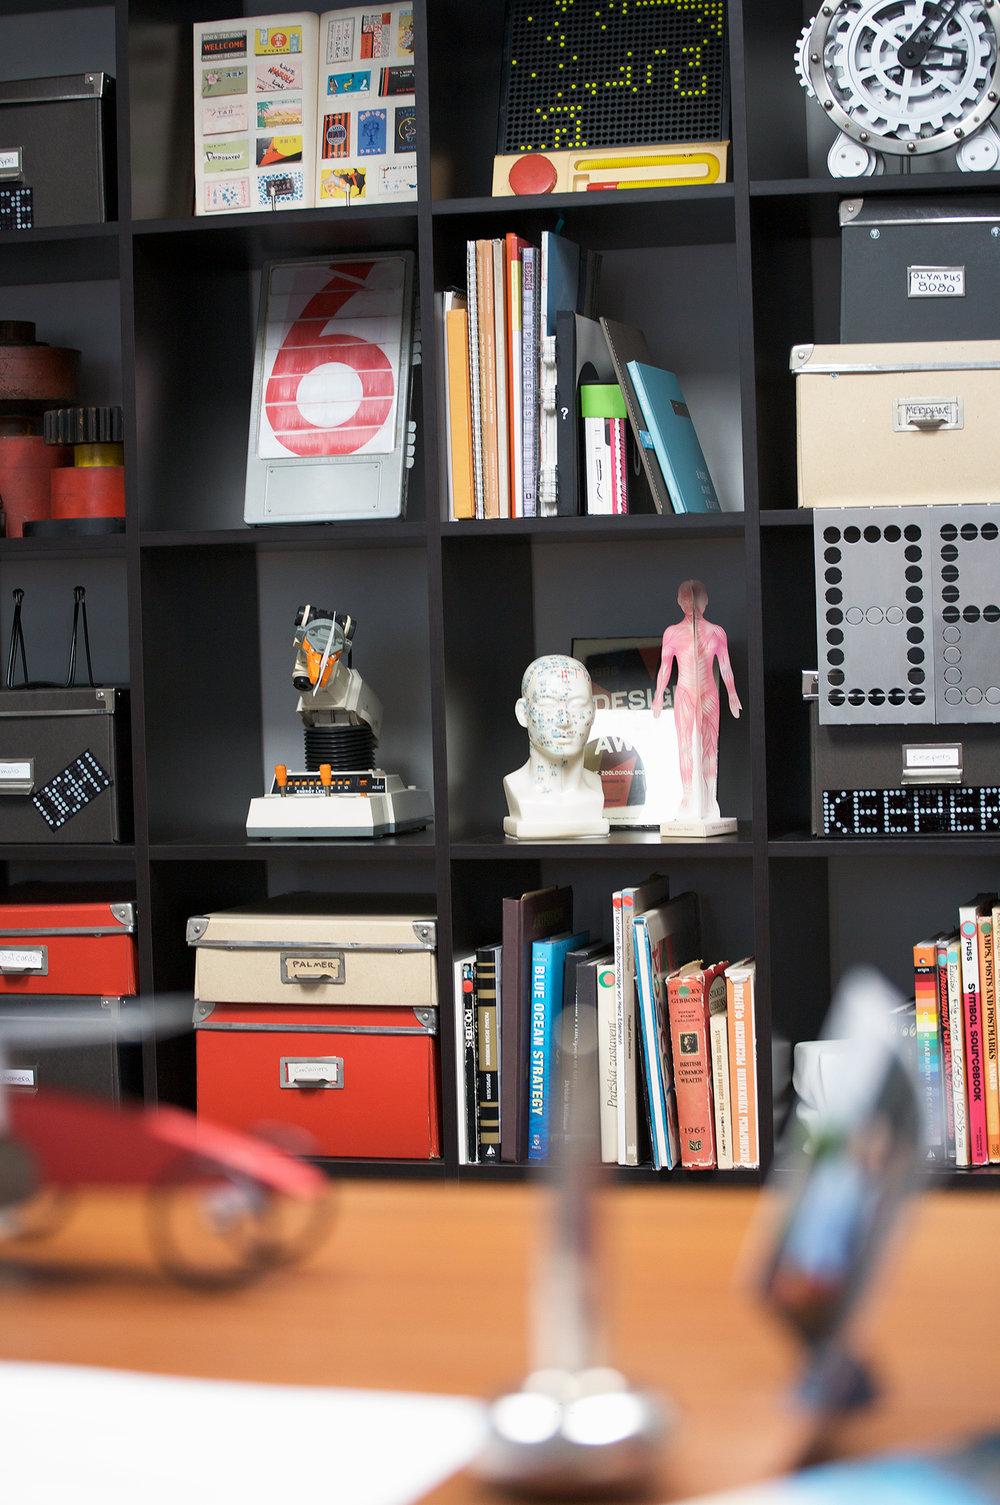 ron-miriello-grafico-san-diego-design-studio-logan-Miriello-branding-officina-15jpg